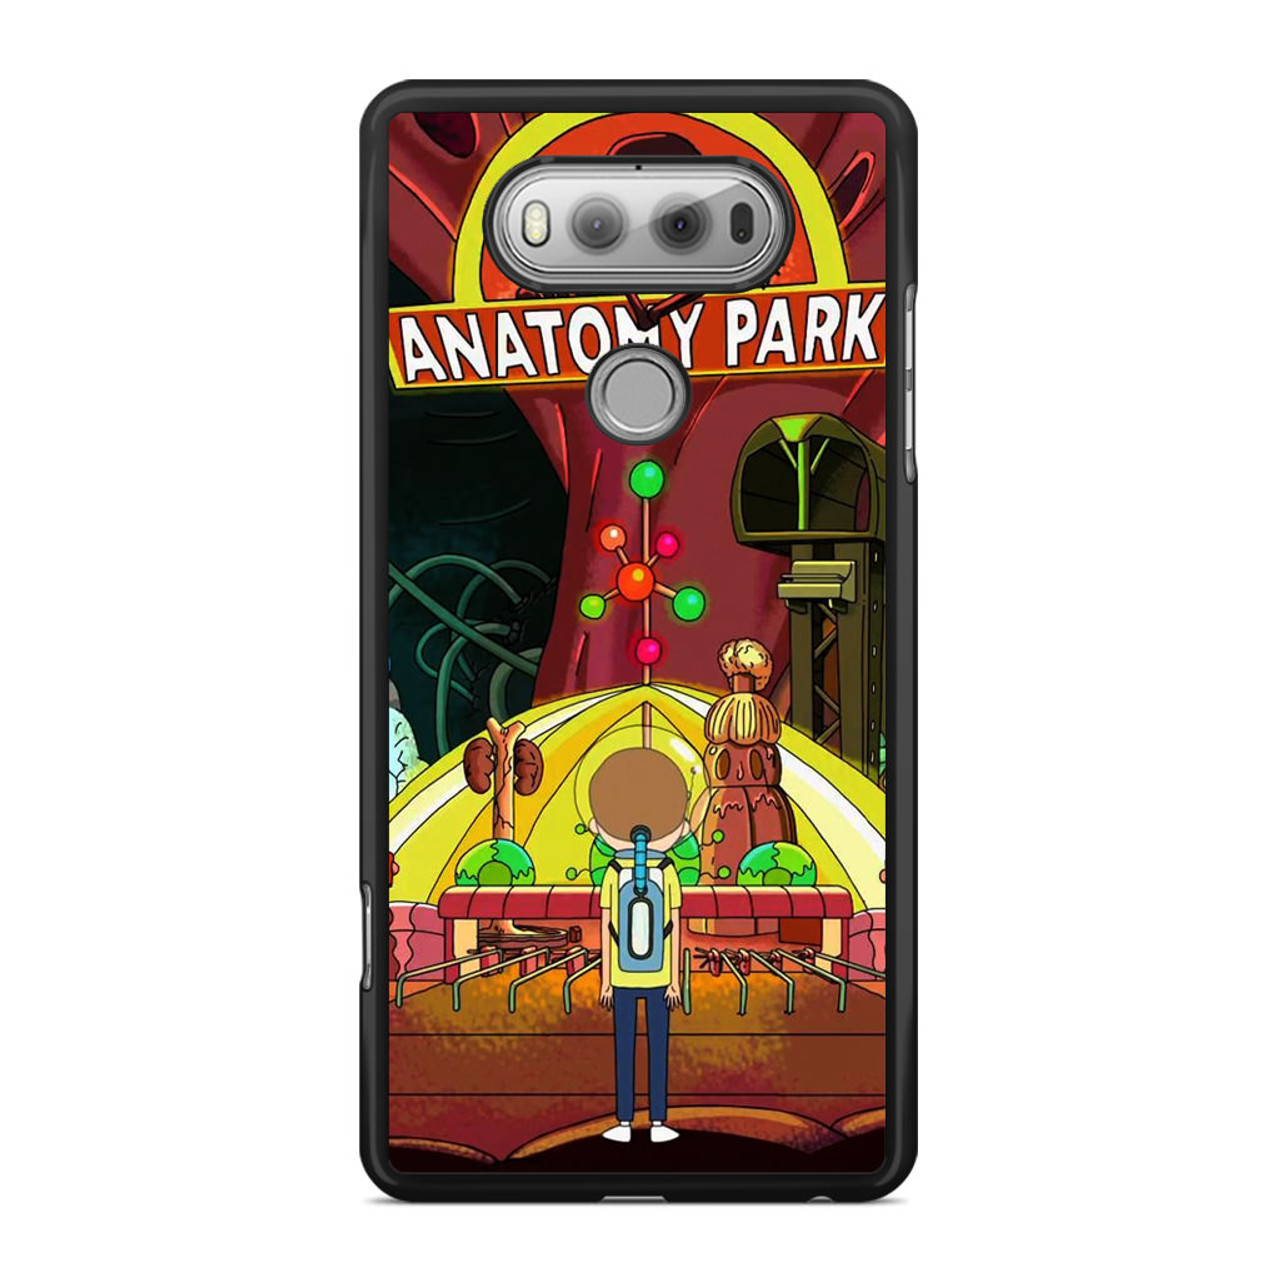 Rick And Morty Anatomy Park LG V20 Case - CASESHUNTER